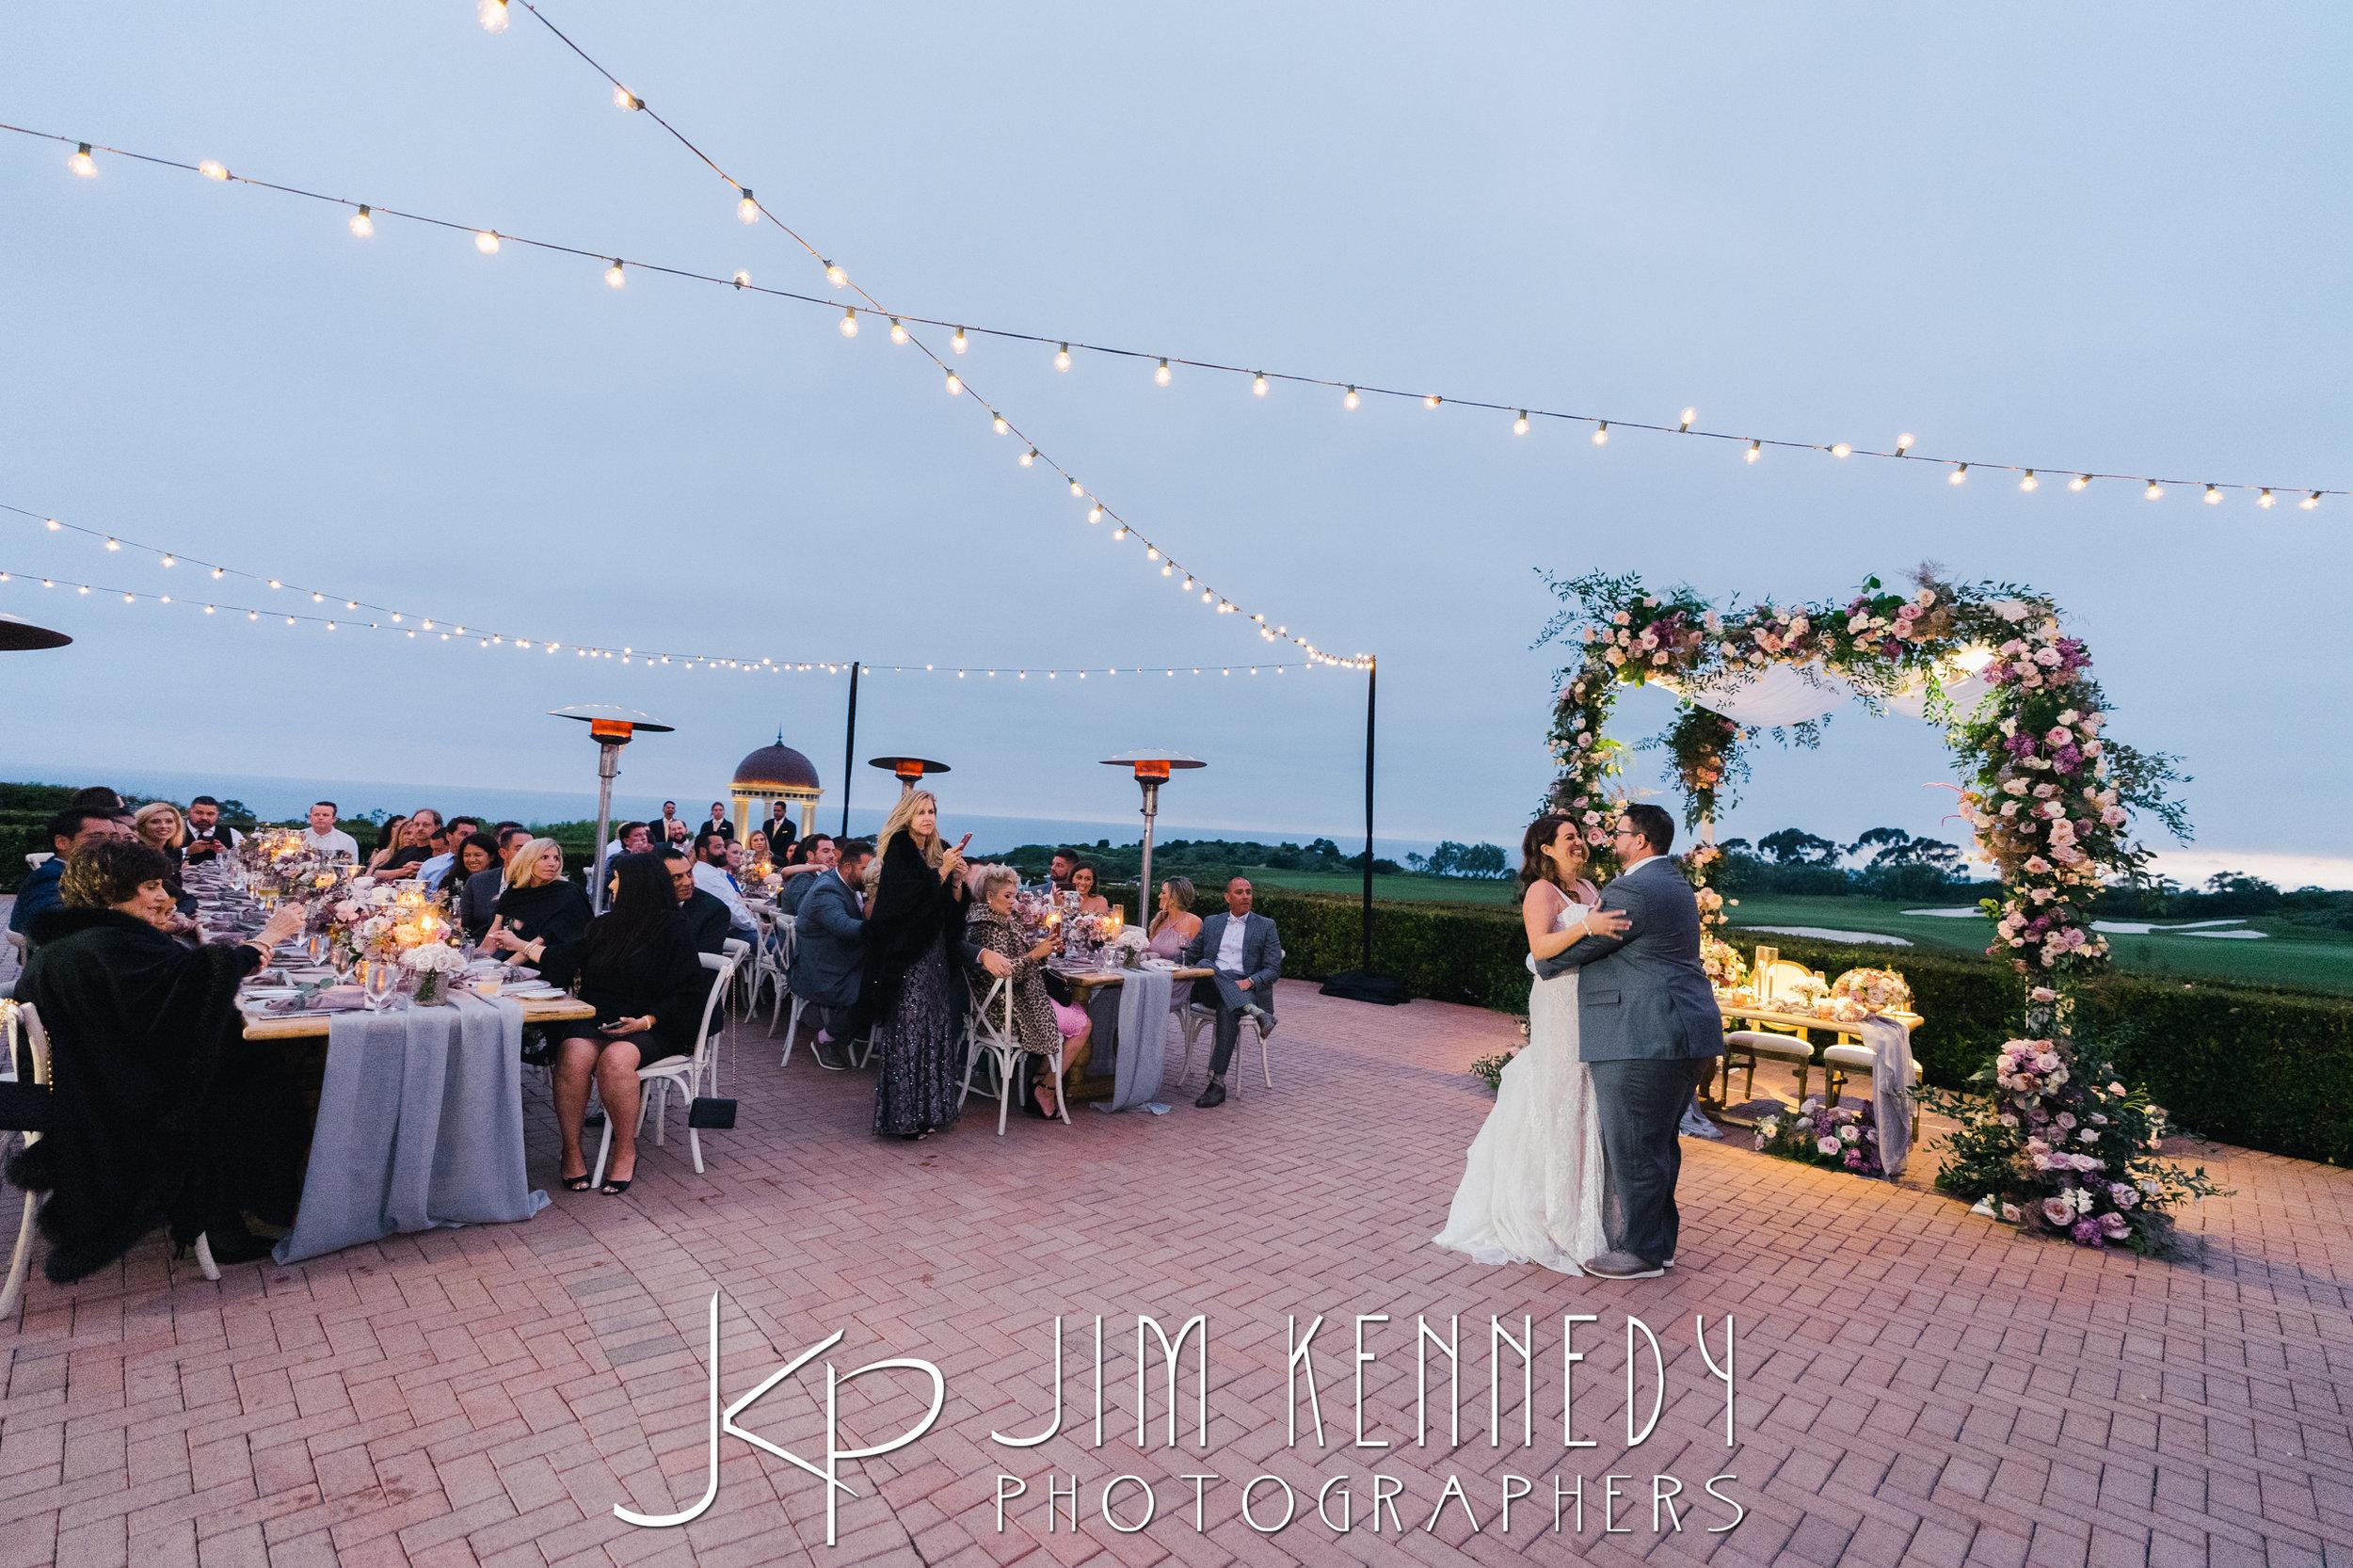 pelican-hill-wedding-jim-kenedy-photographers_0219.JPG